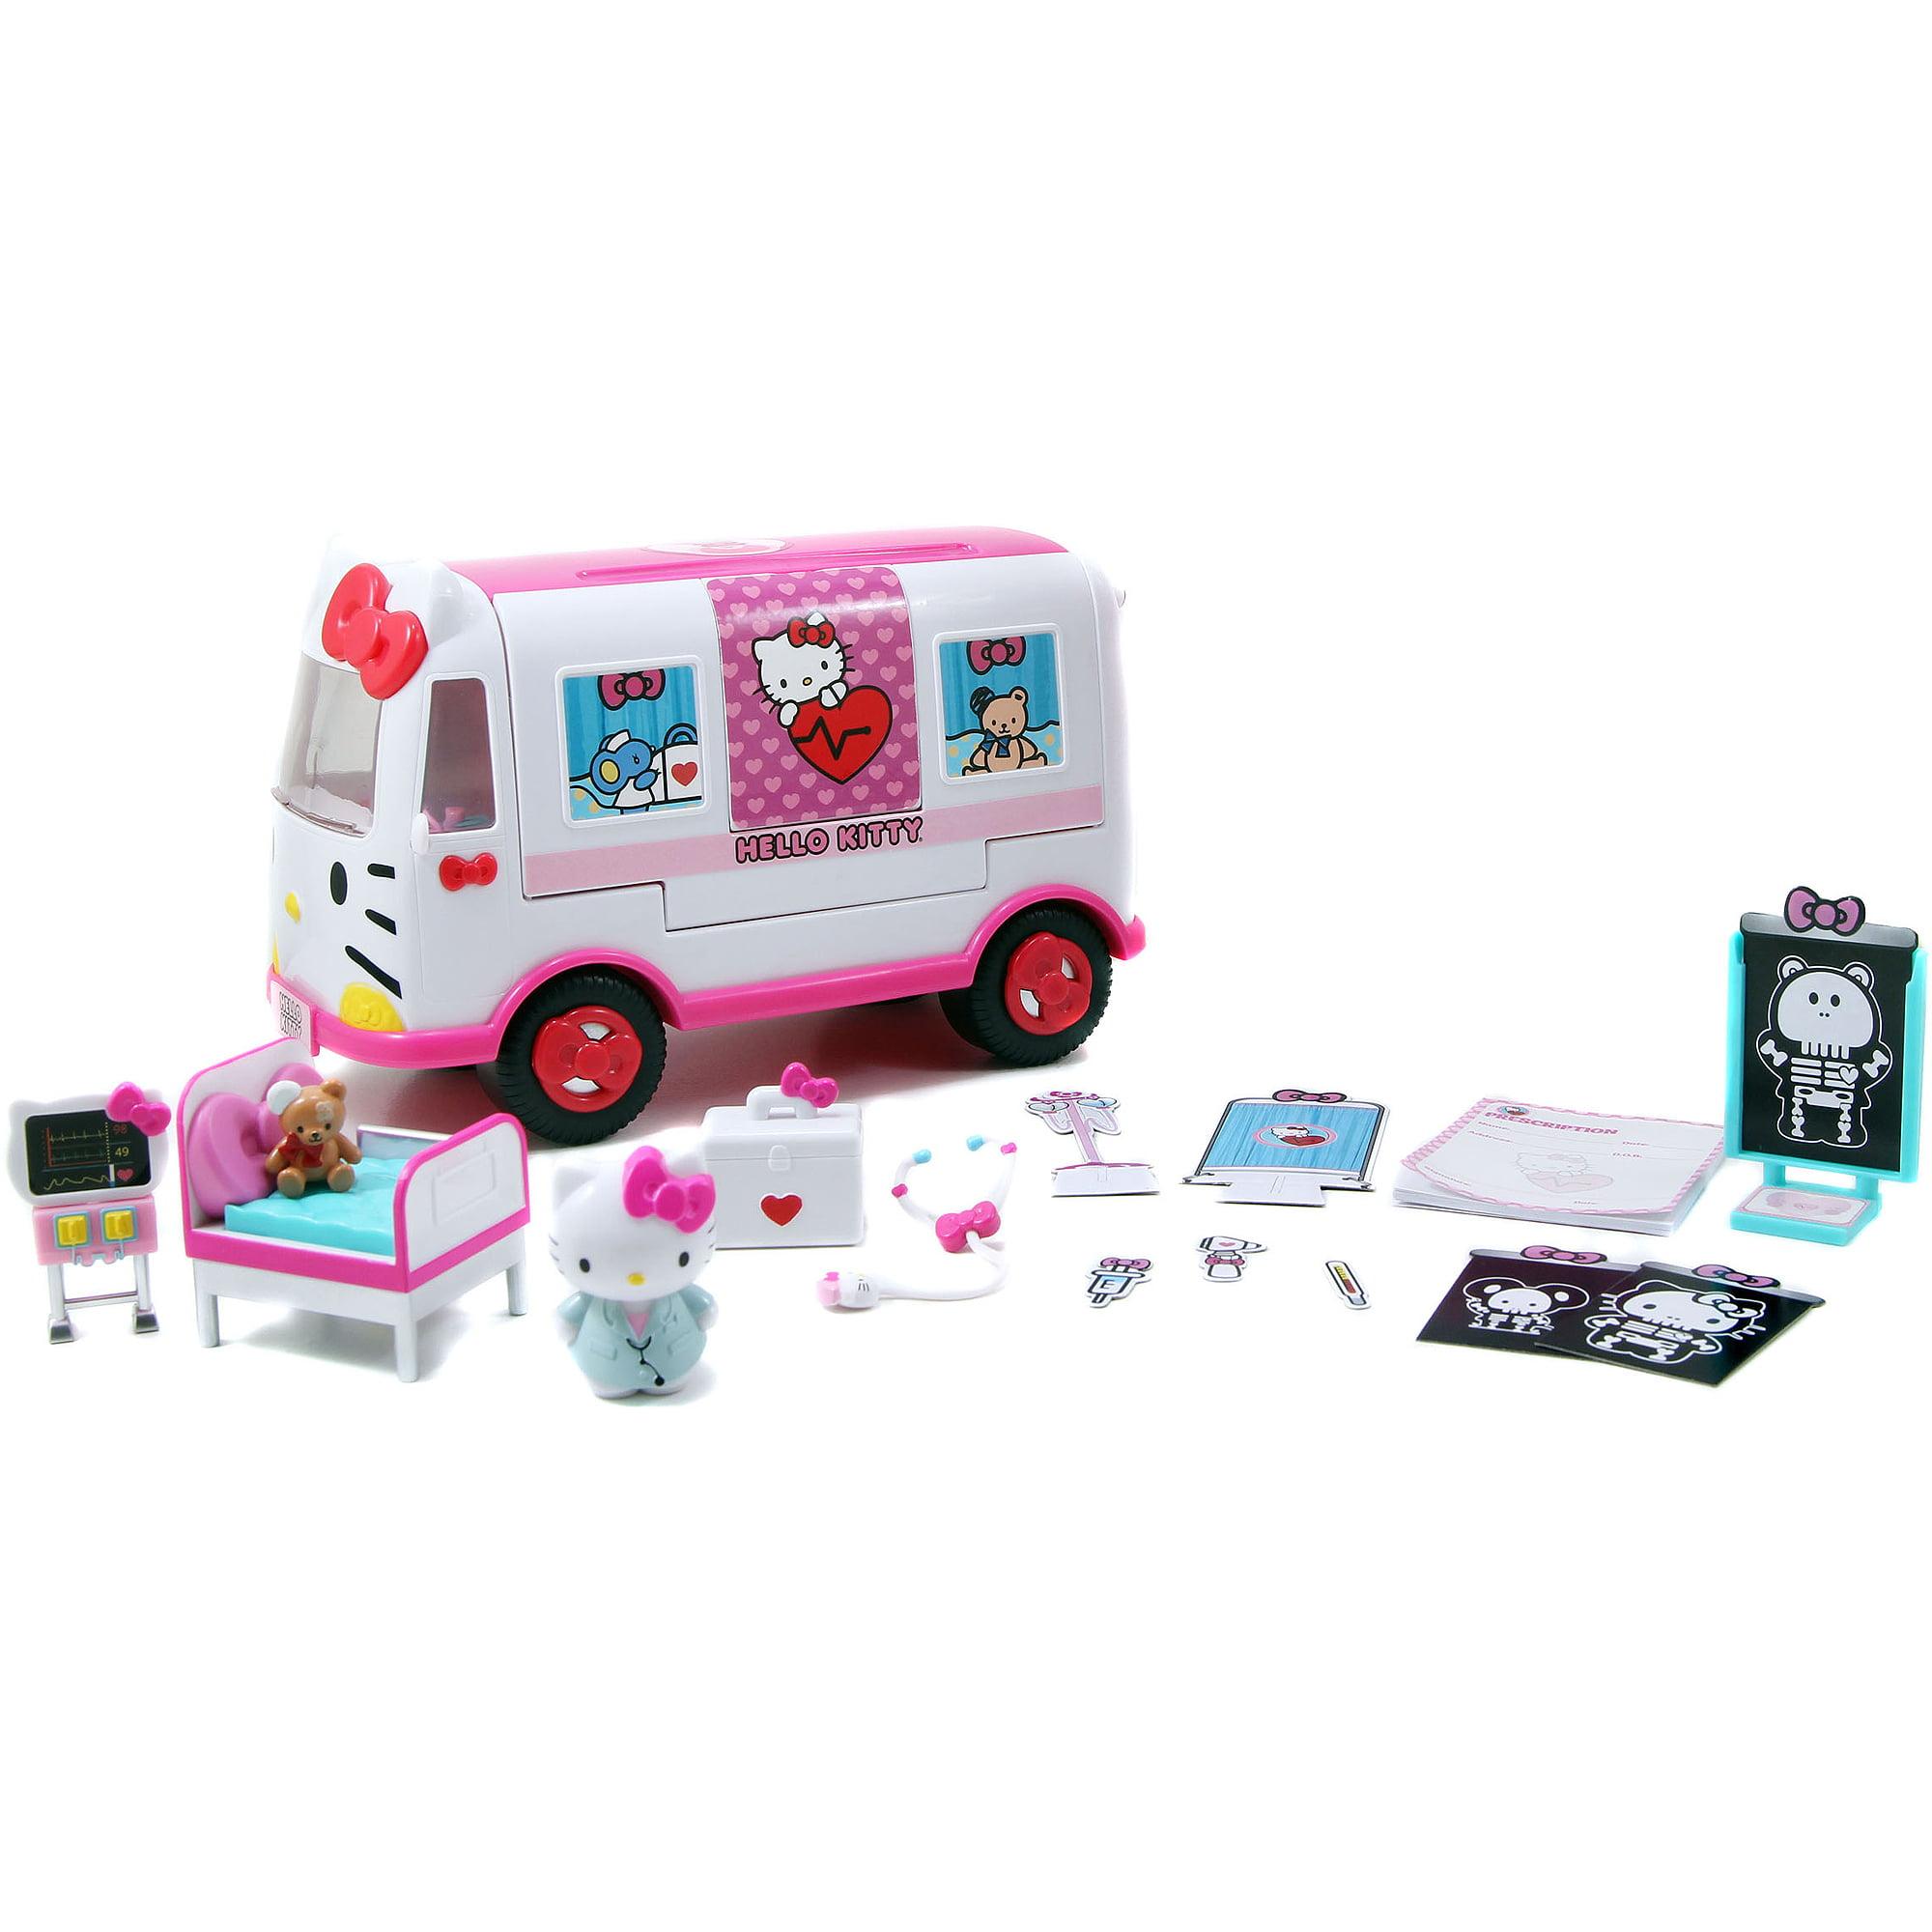 Hello Kitty Emergency Ambulance Playset by